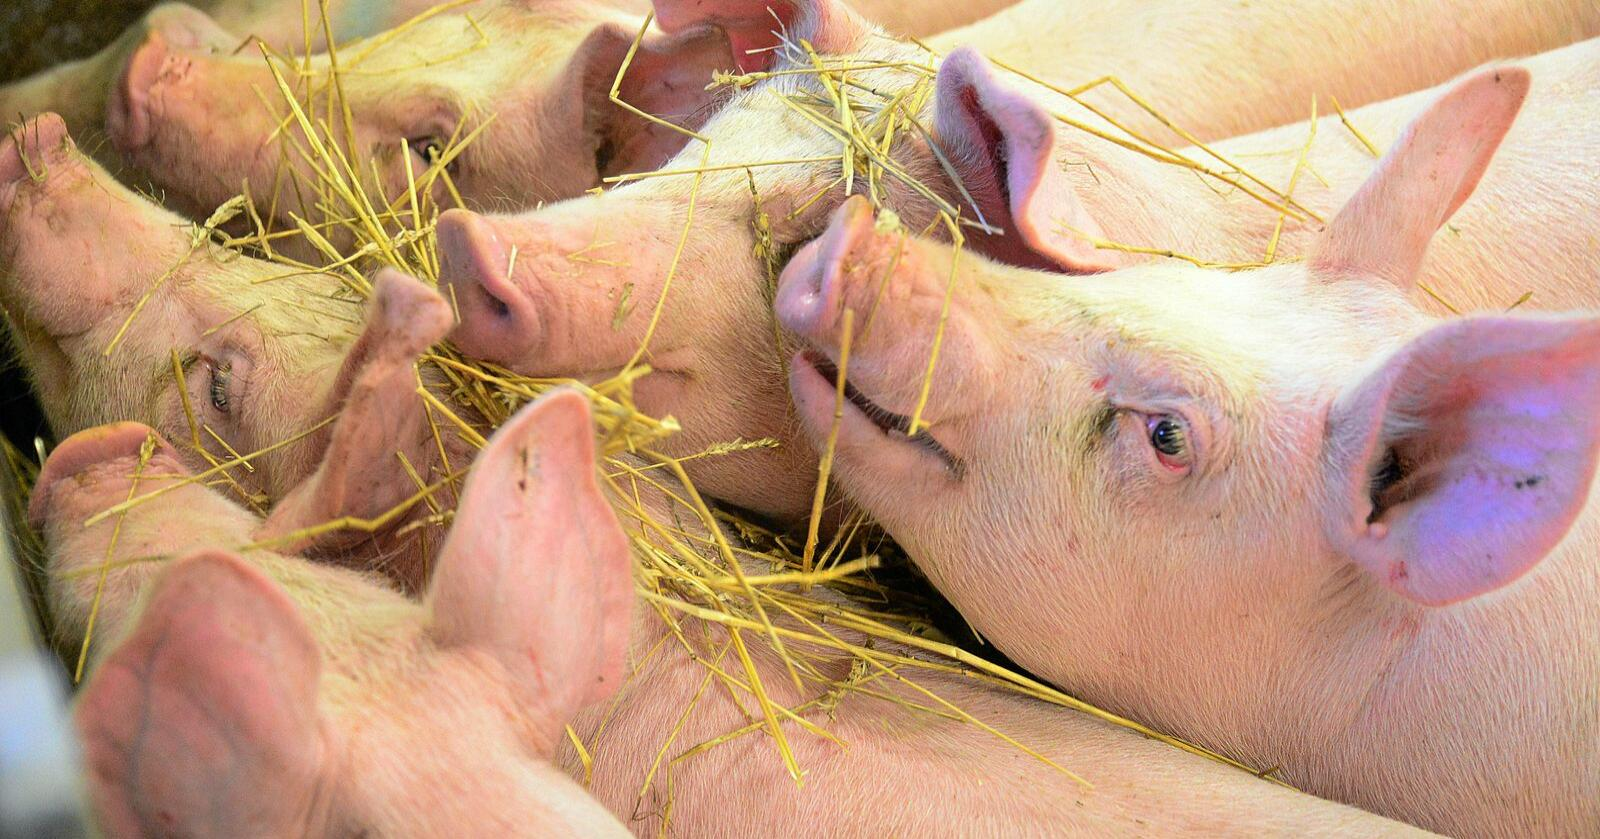 Jeg håper vi snart kan ha en debatt om utviklingen i landbrukspolitikken, der dyrene for en gang skyld kan være i fokus, skriver Norun Haugen. Foto: Siri Juell Rasmussen